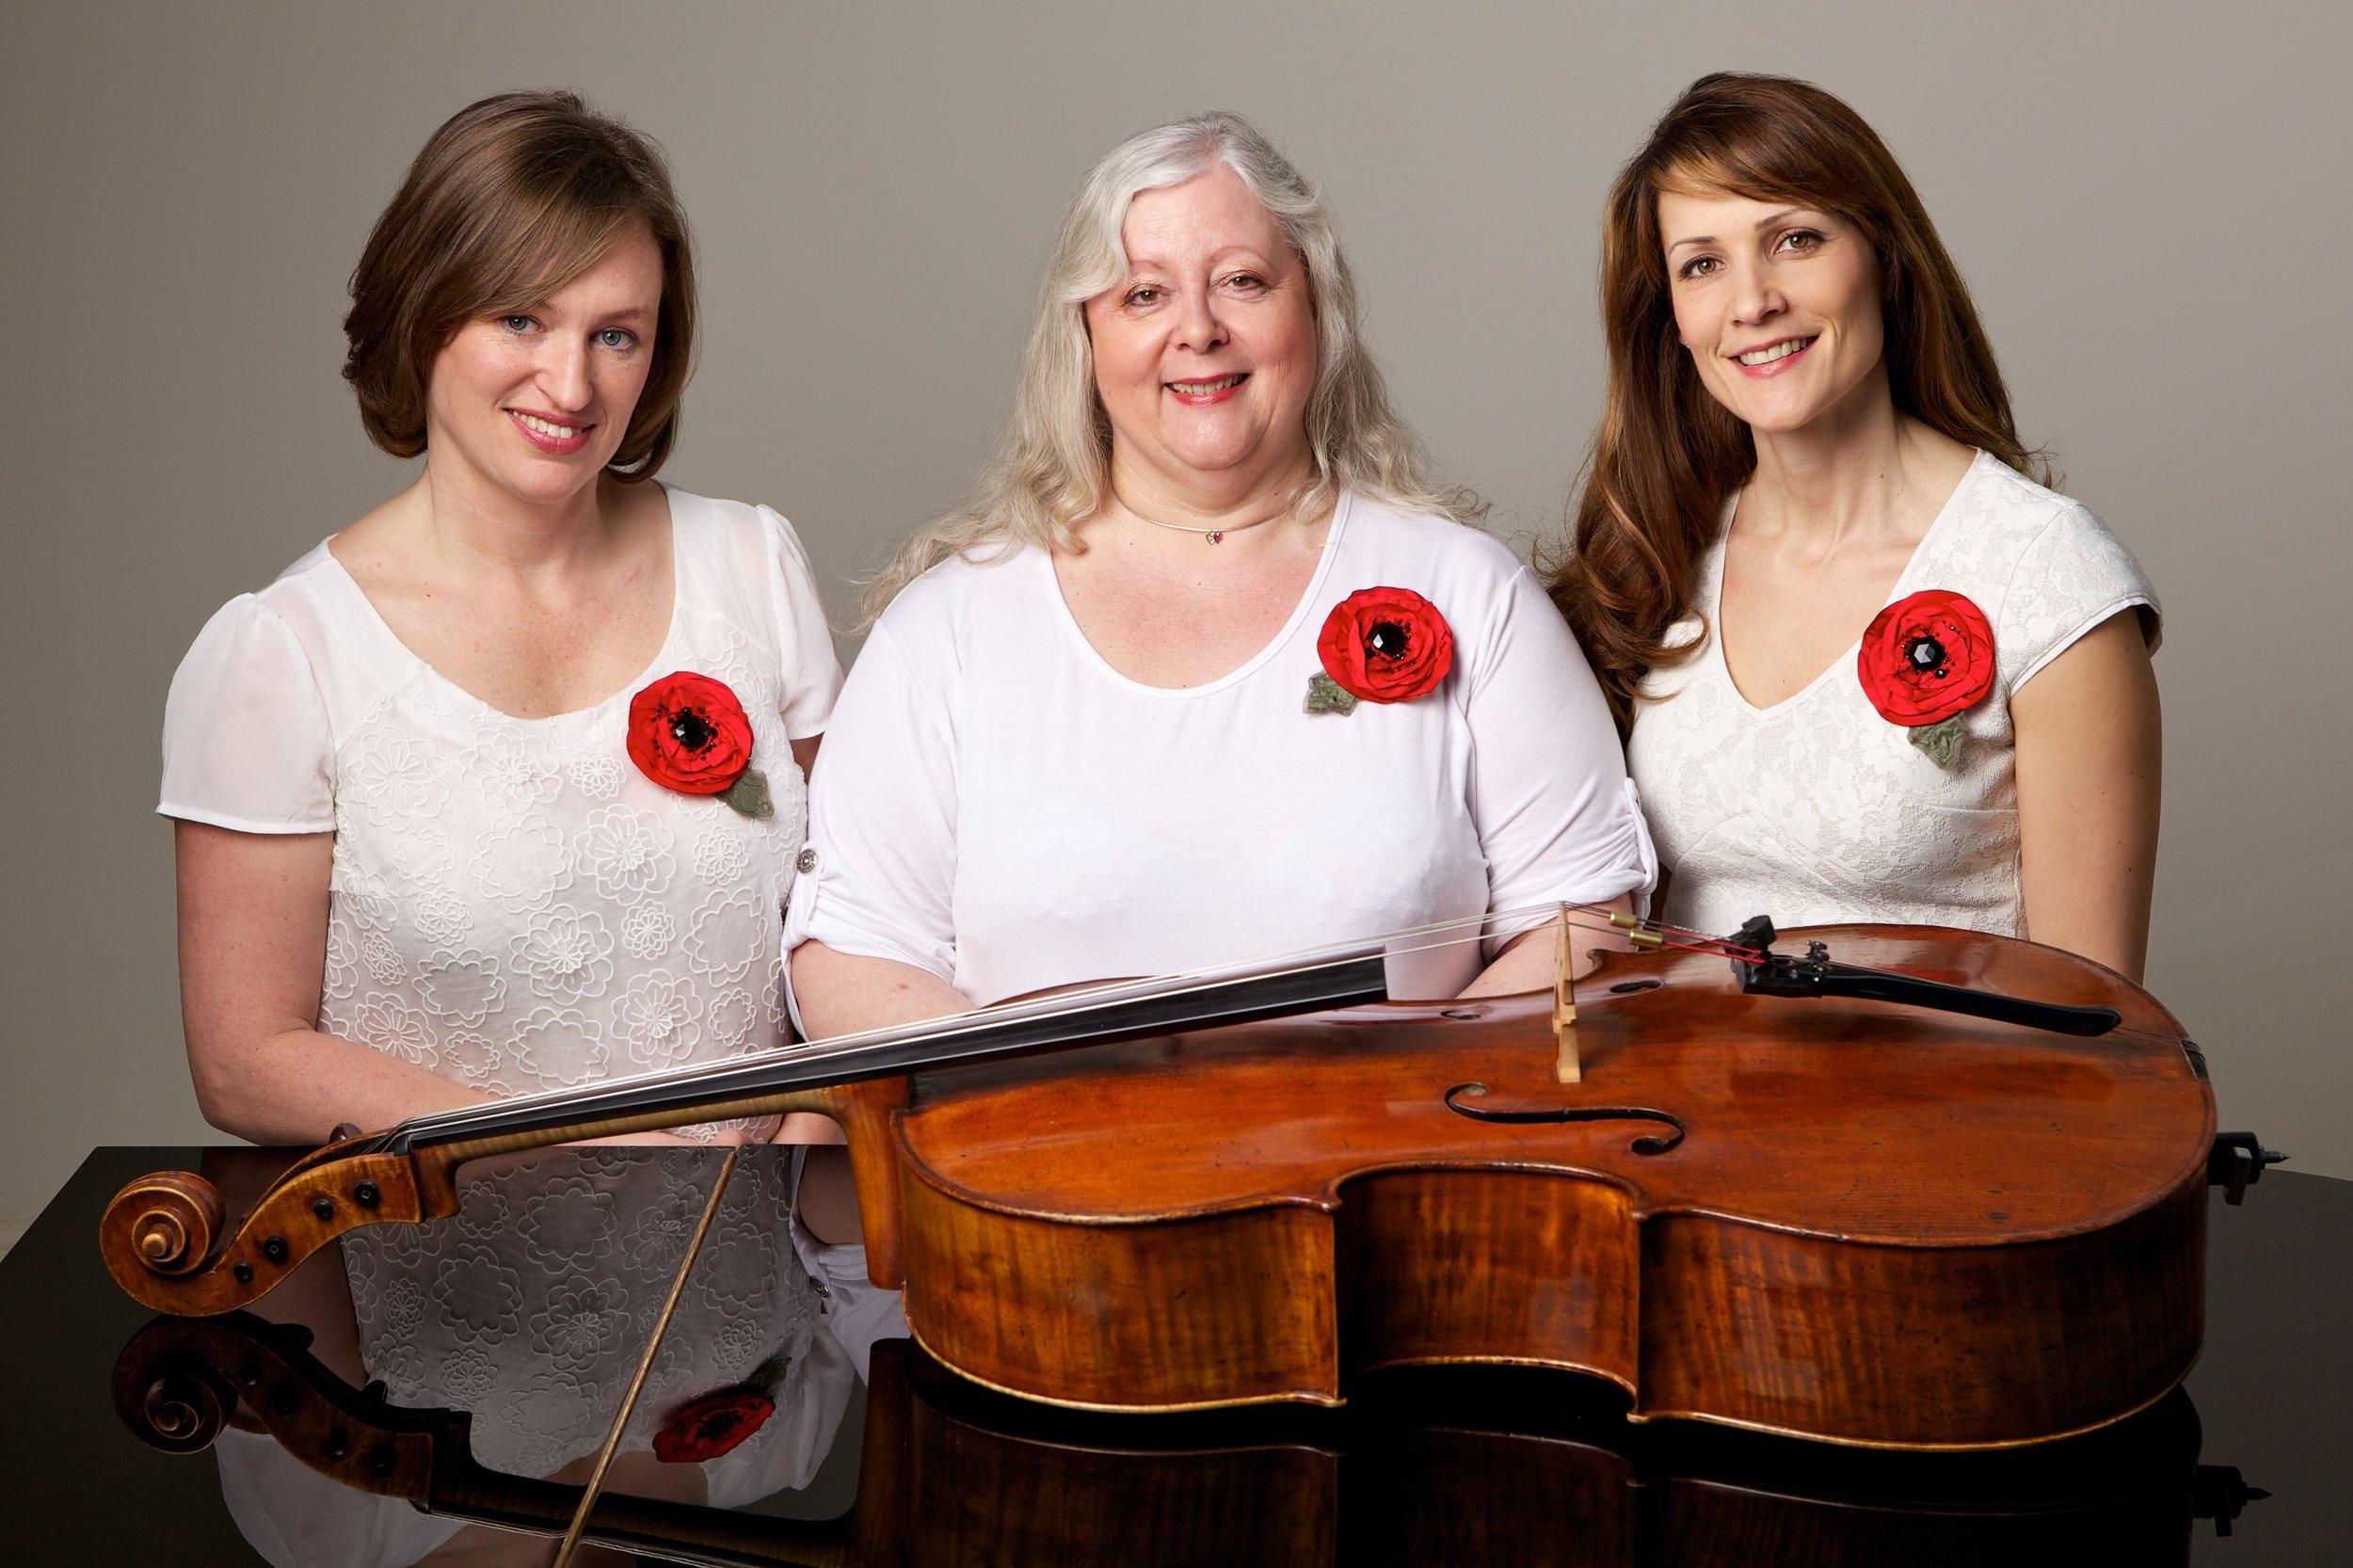 From left: Janine Smith, Corrine Frost, Helena Cavan.